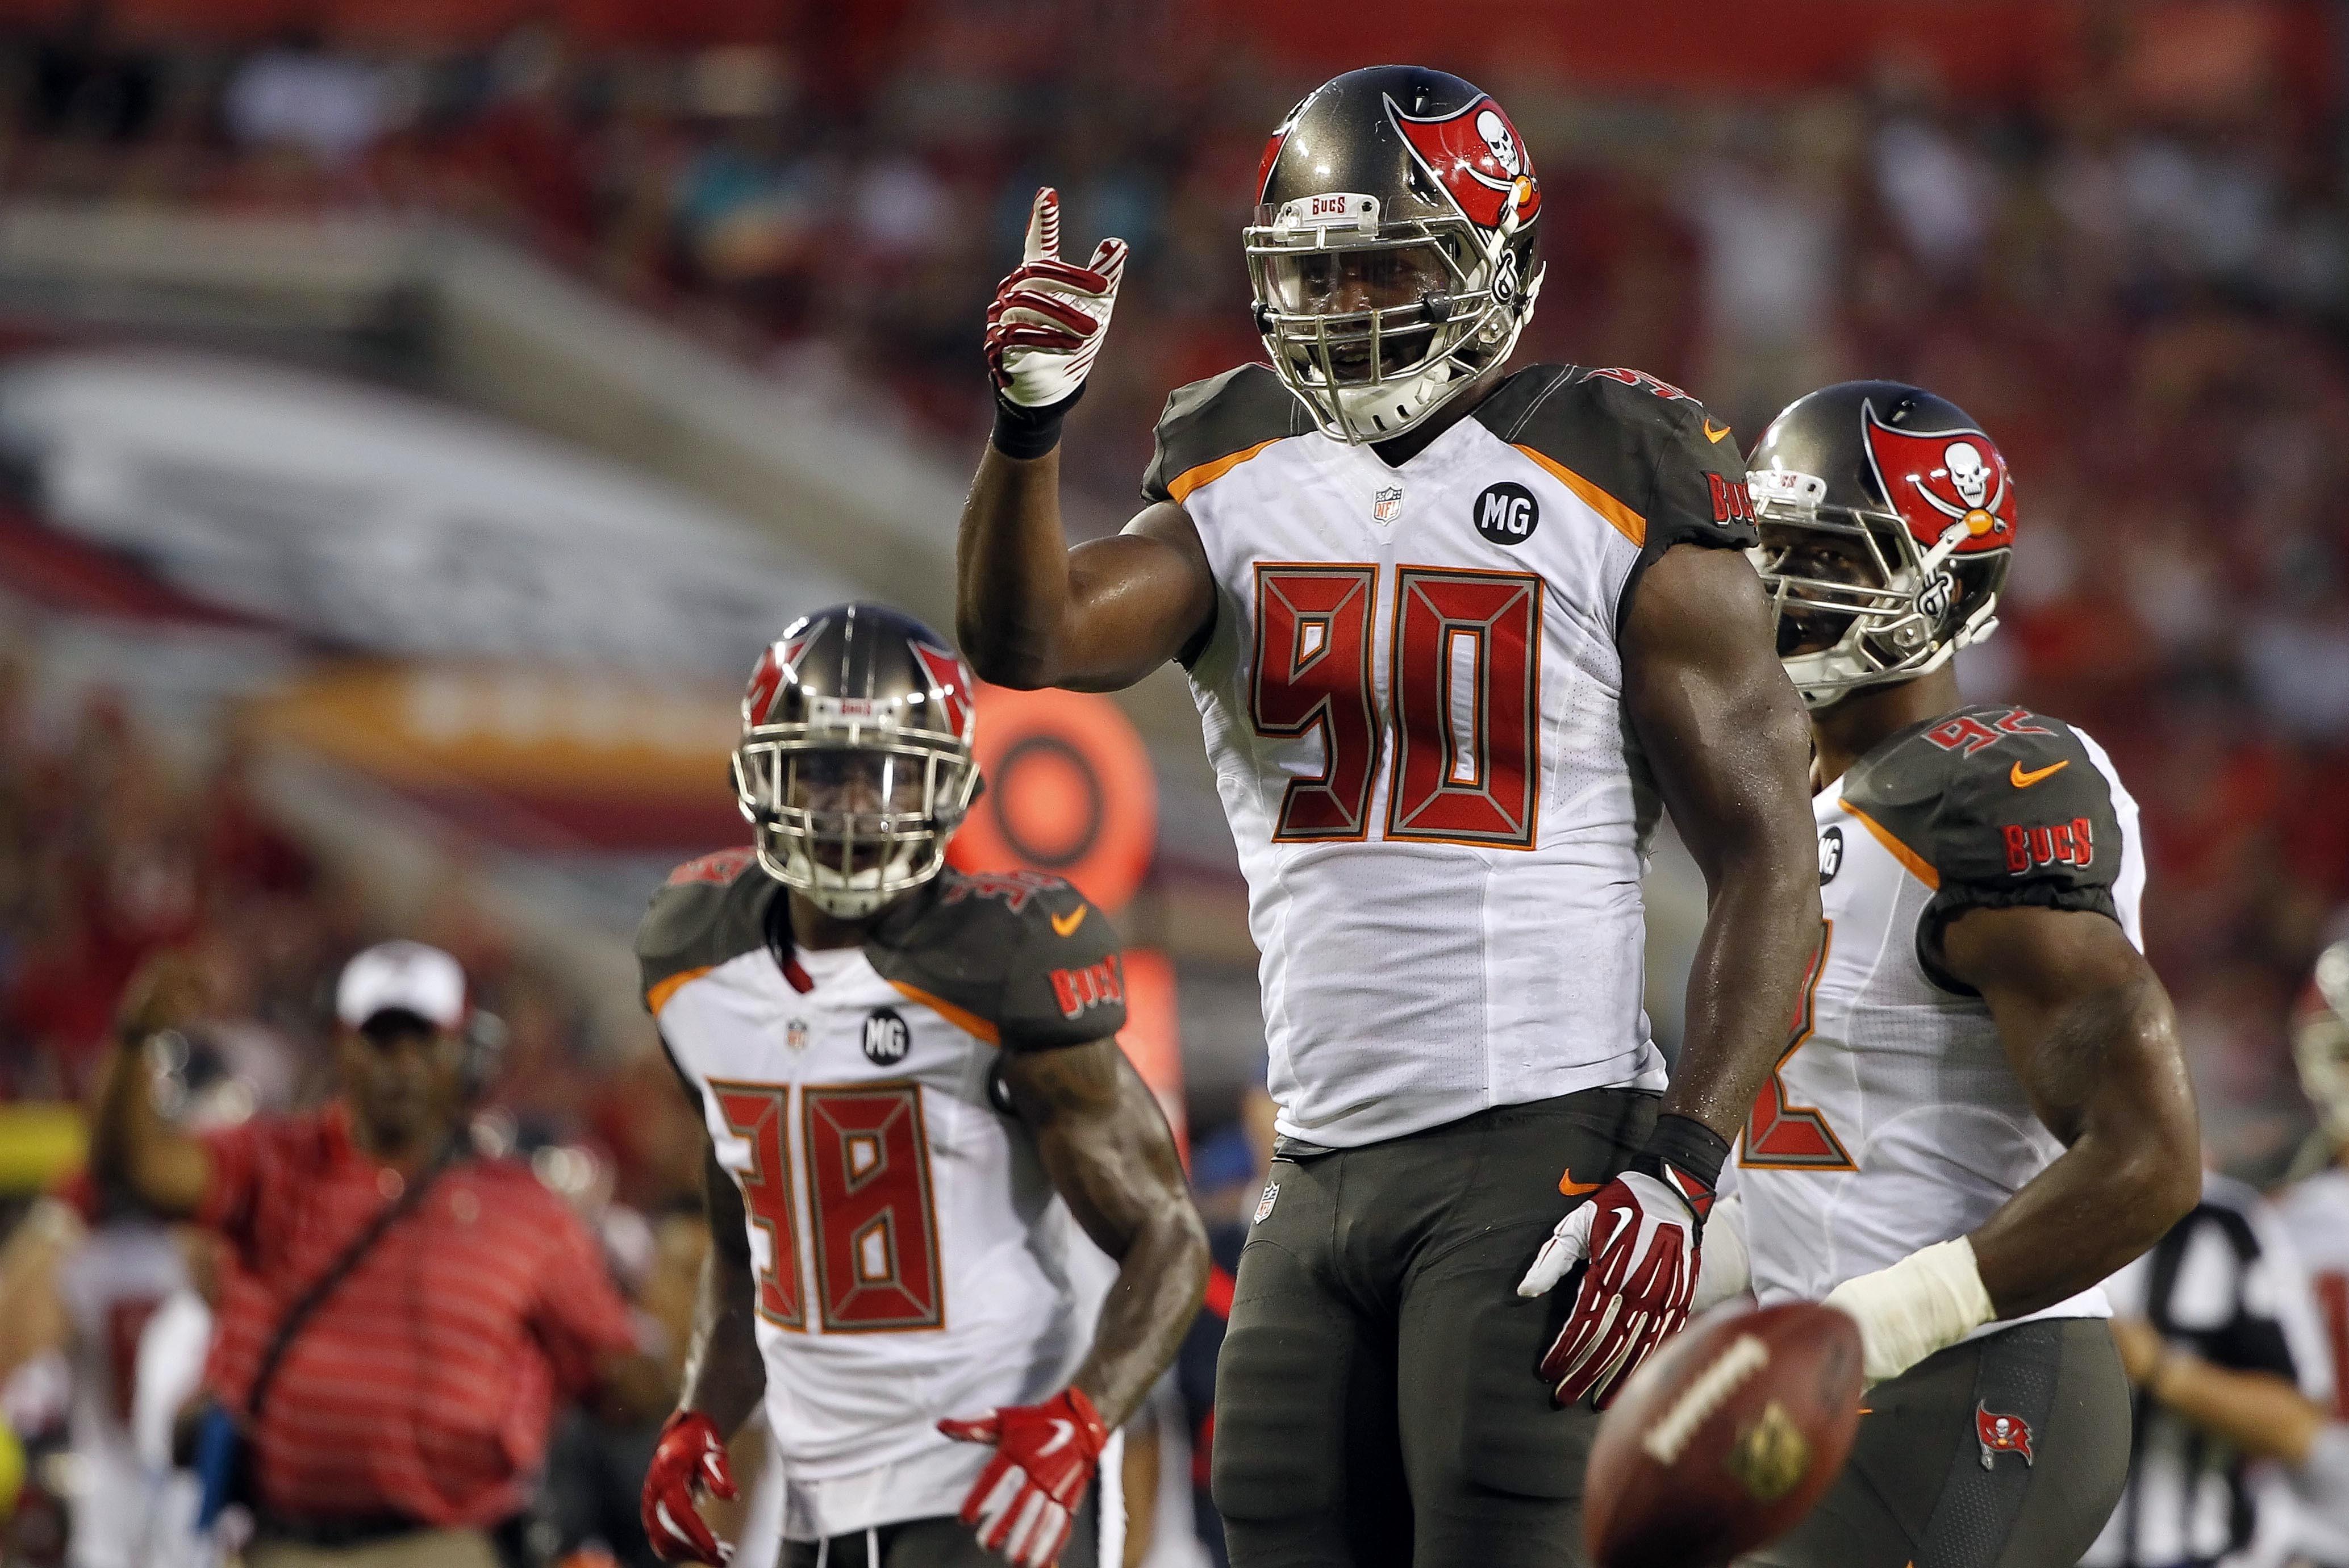 NFL Jerseys - Tampa Bay Buccaneers vs. Buffalo Bills: Bucs Preseason Week 3 Game ...